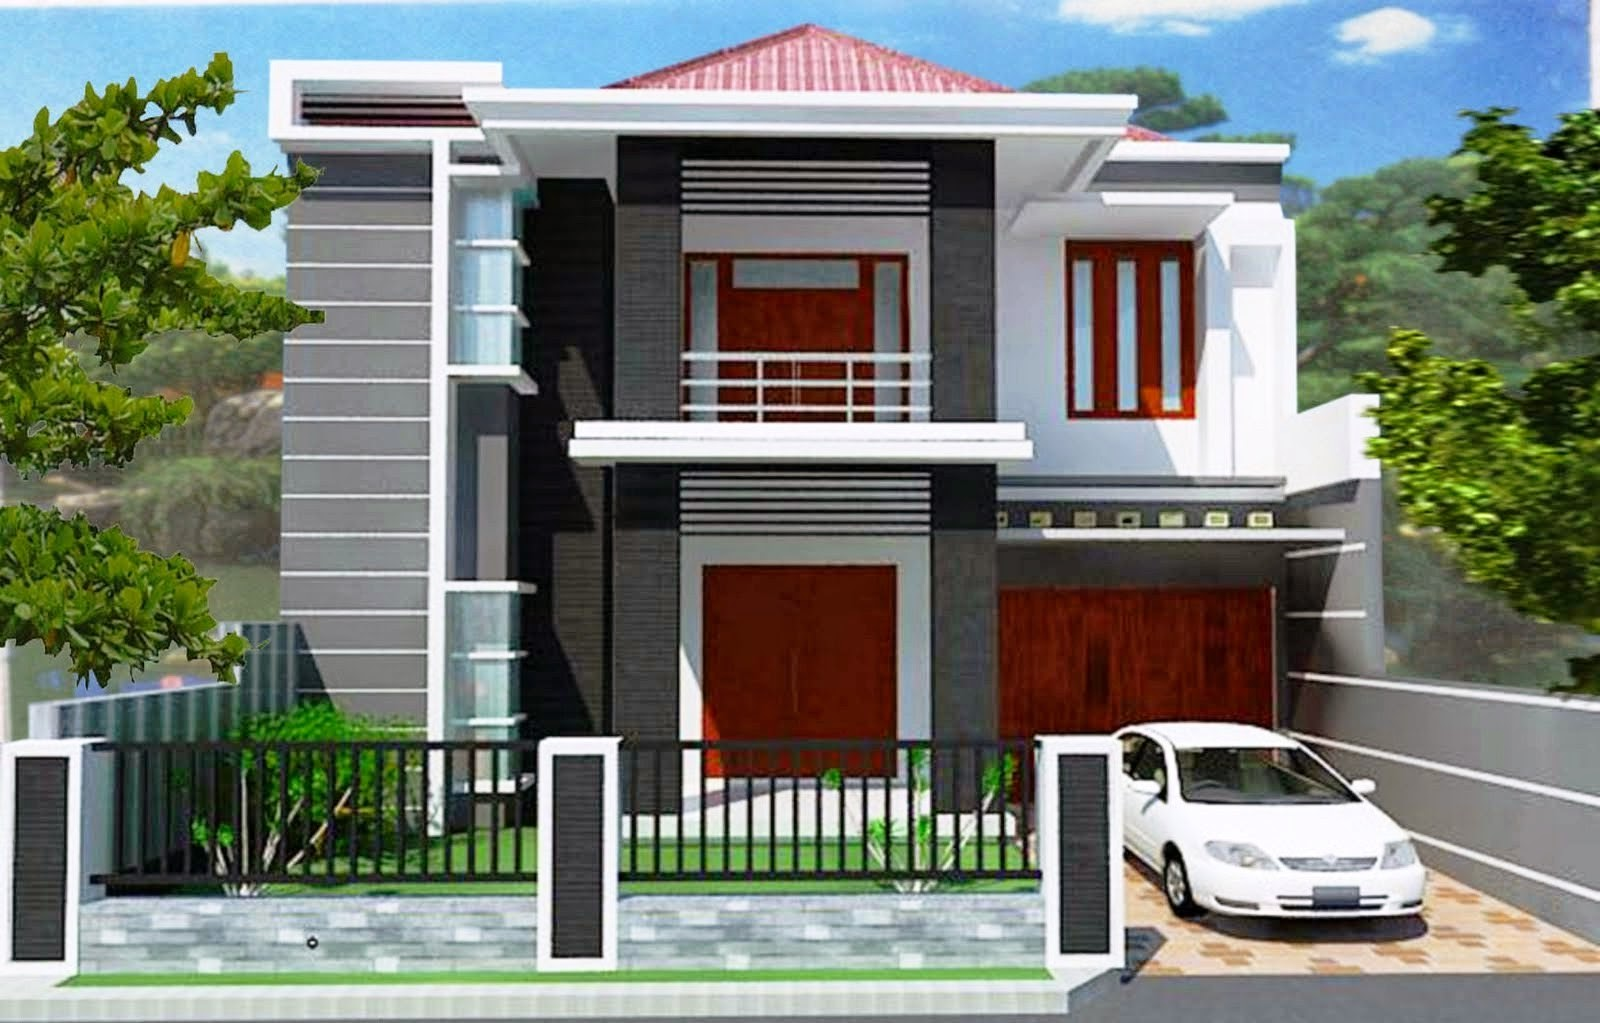 46+ Gambar Rumah Bertingkat Semi Permanen HD Terbaru